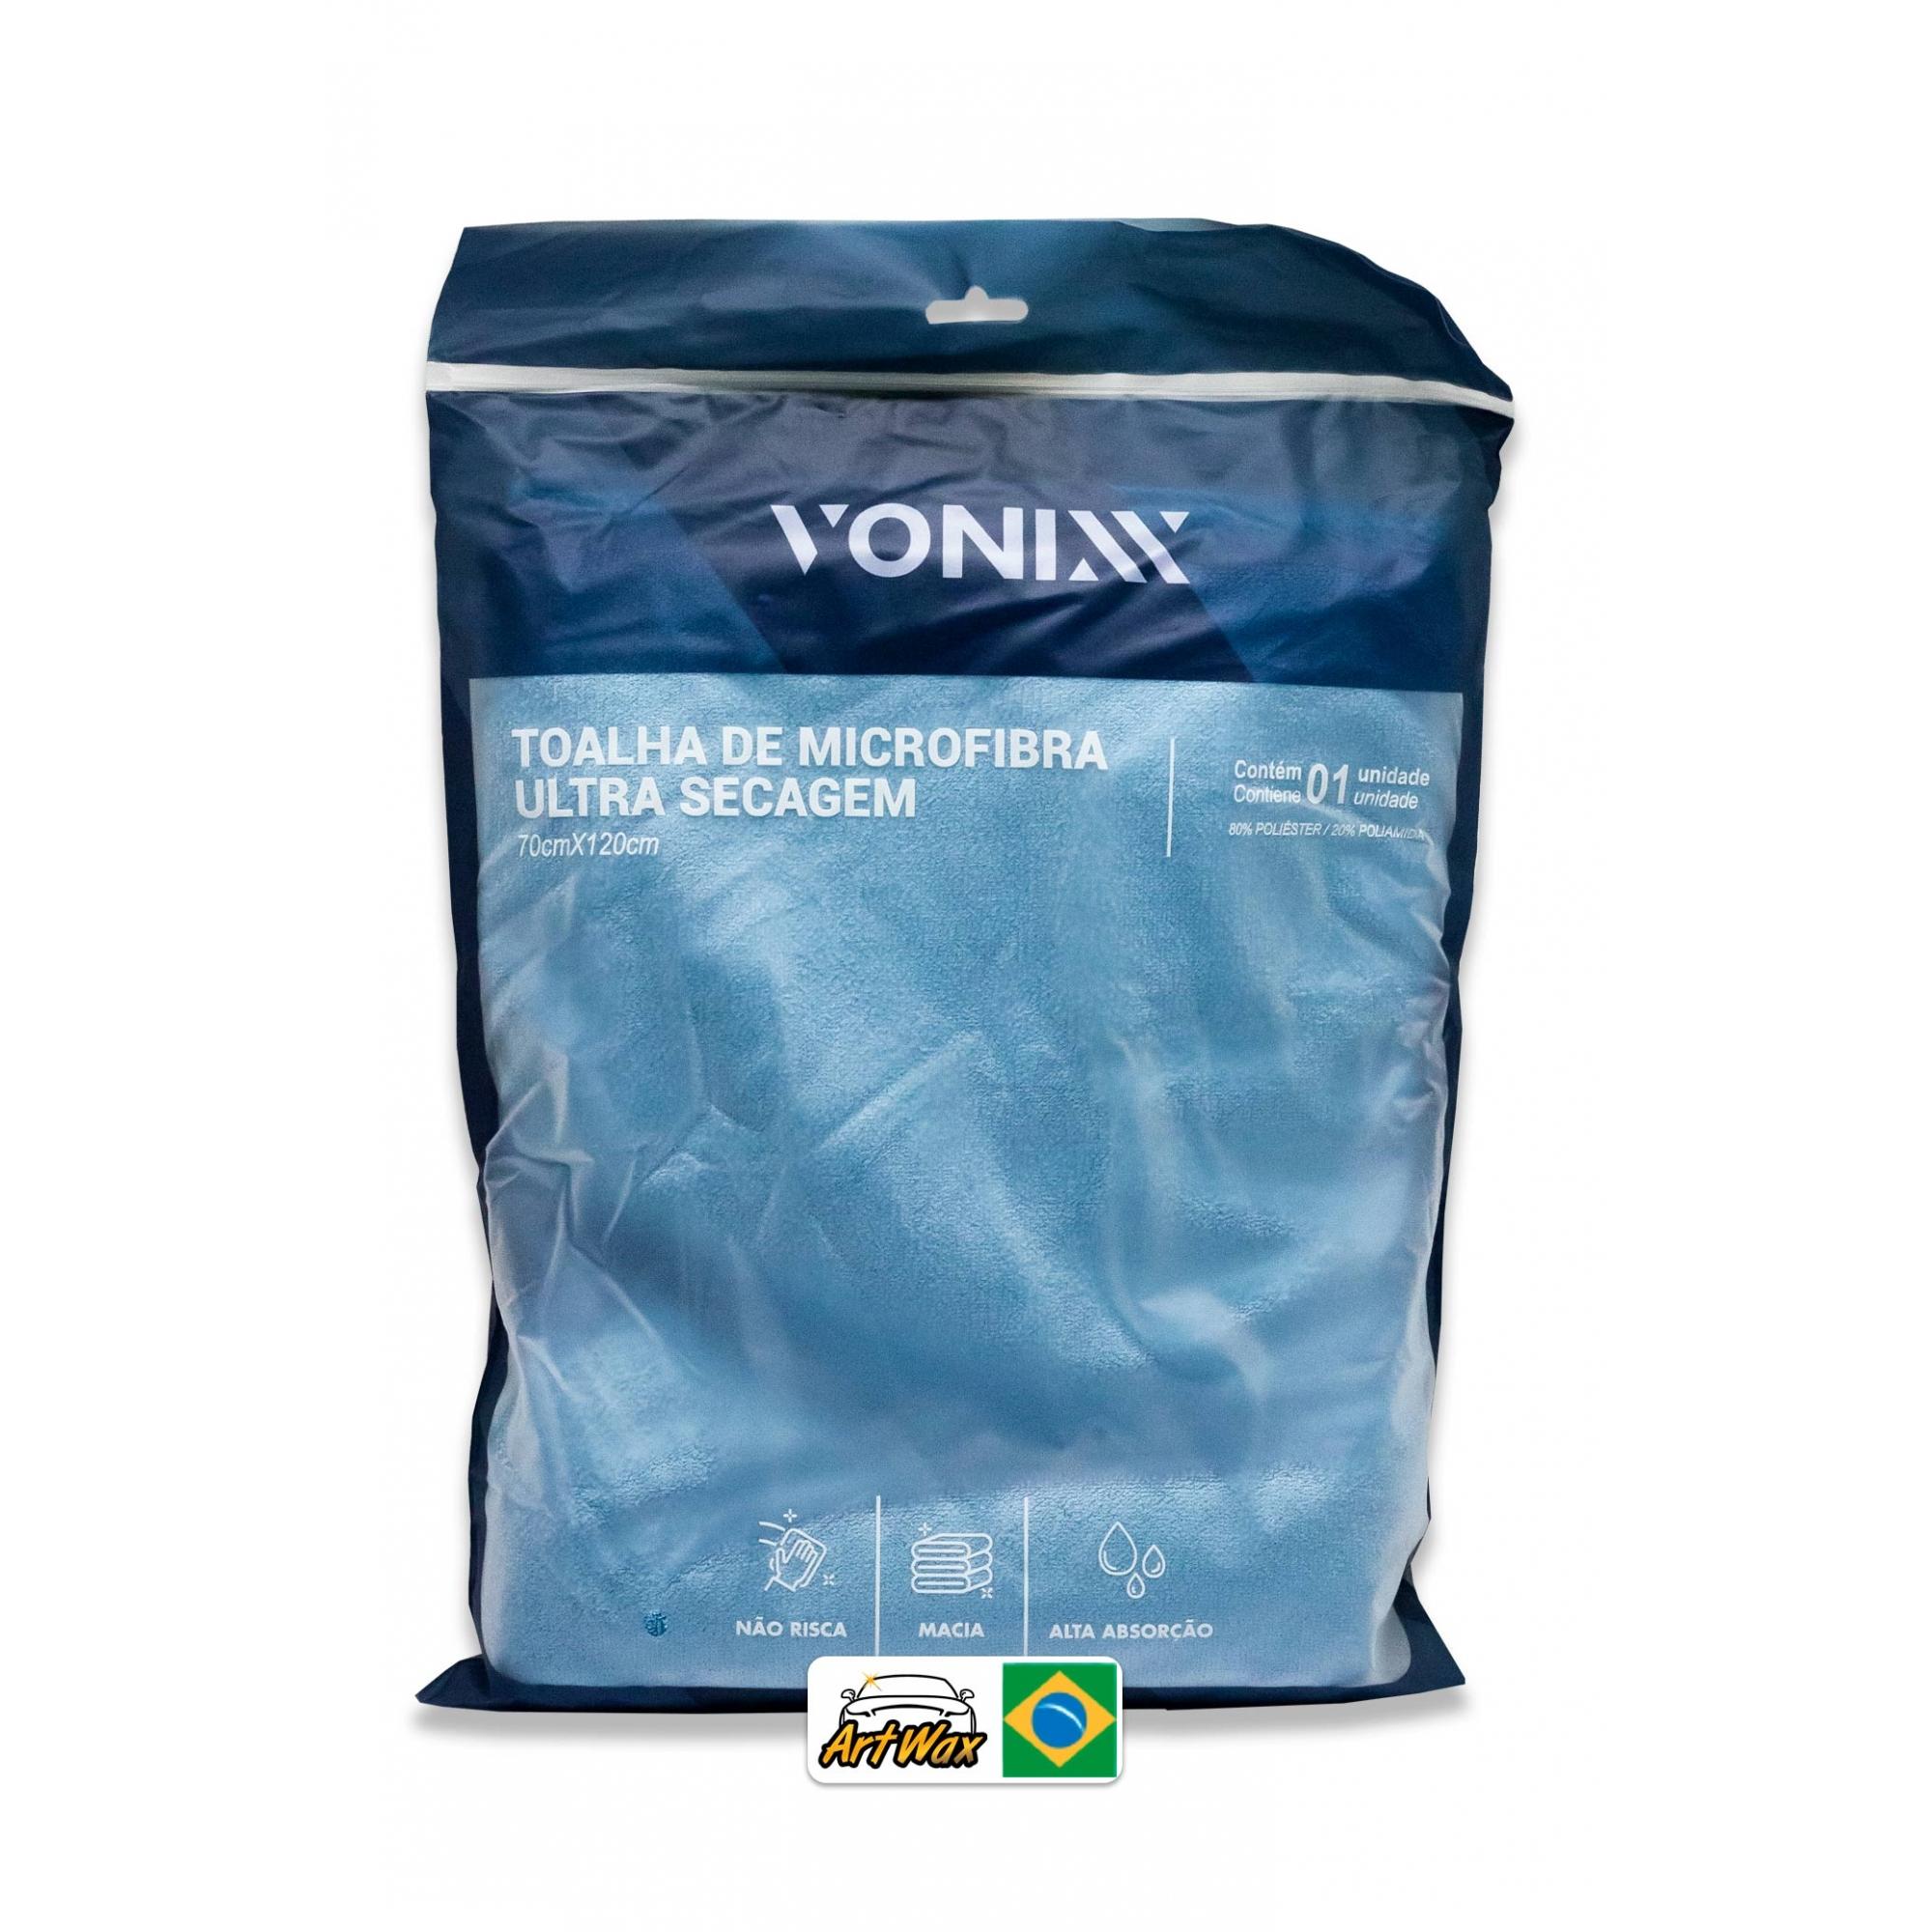 Vonixx Toalha Ultra Secagem 70x120cm 400gsm